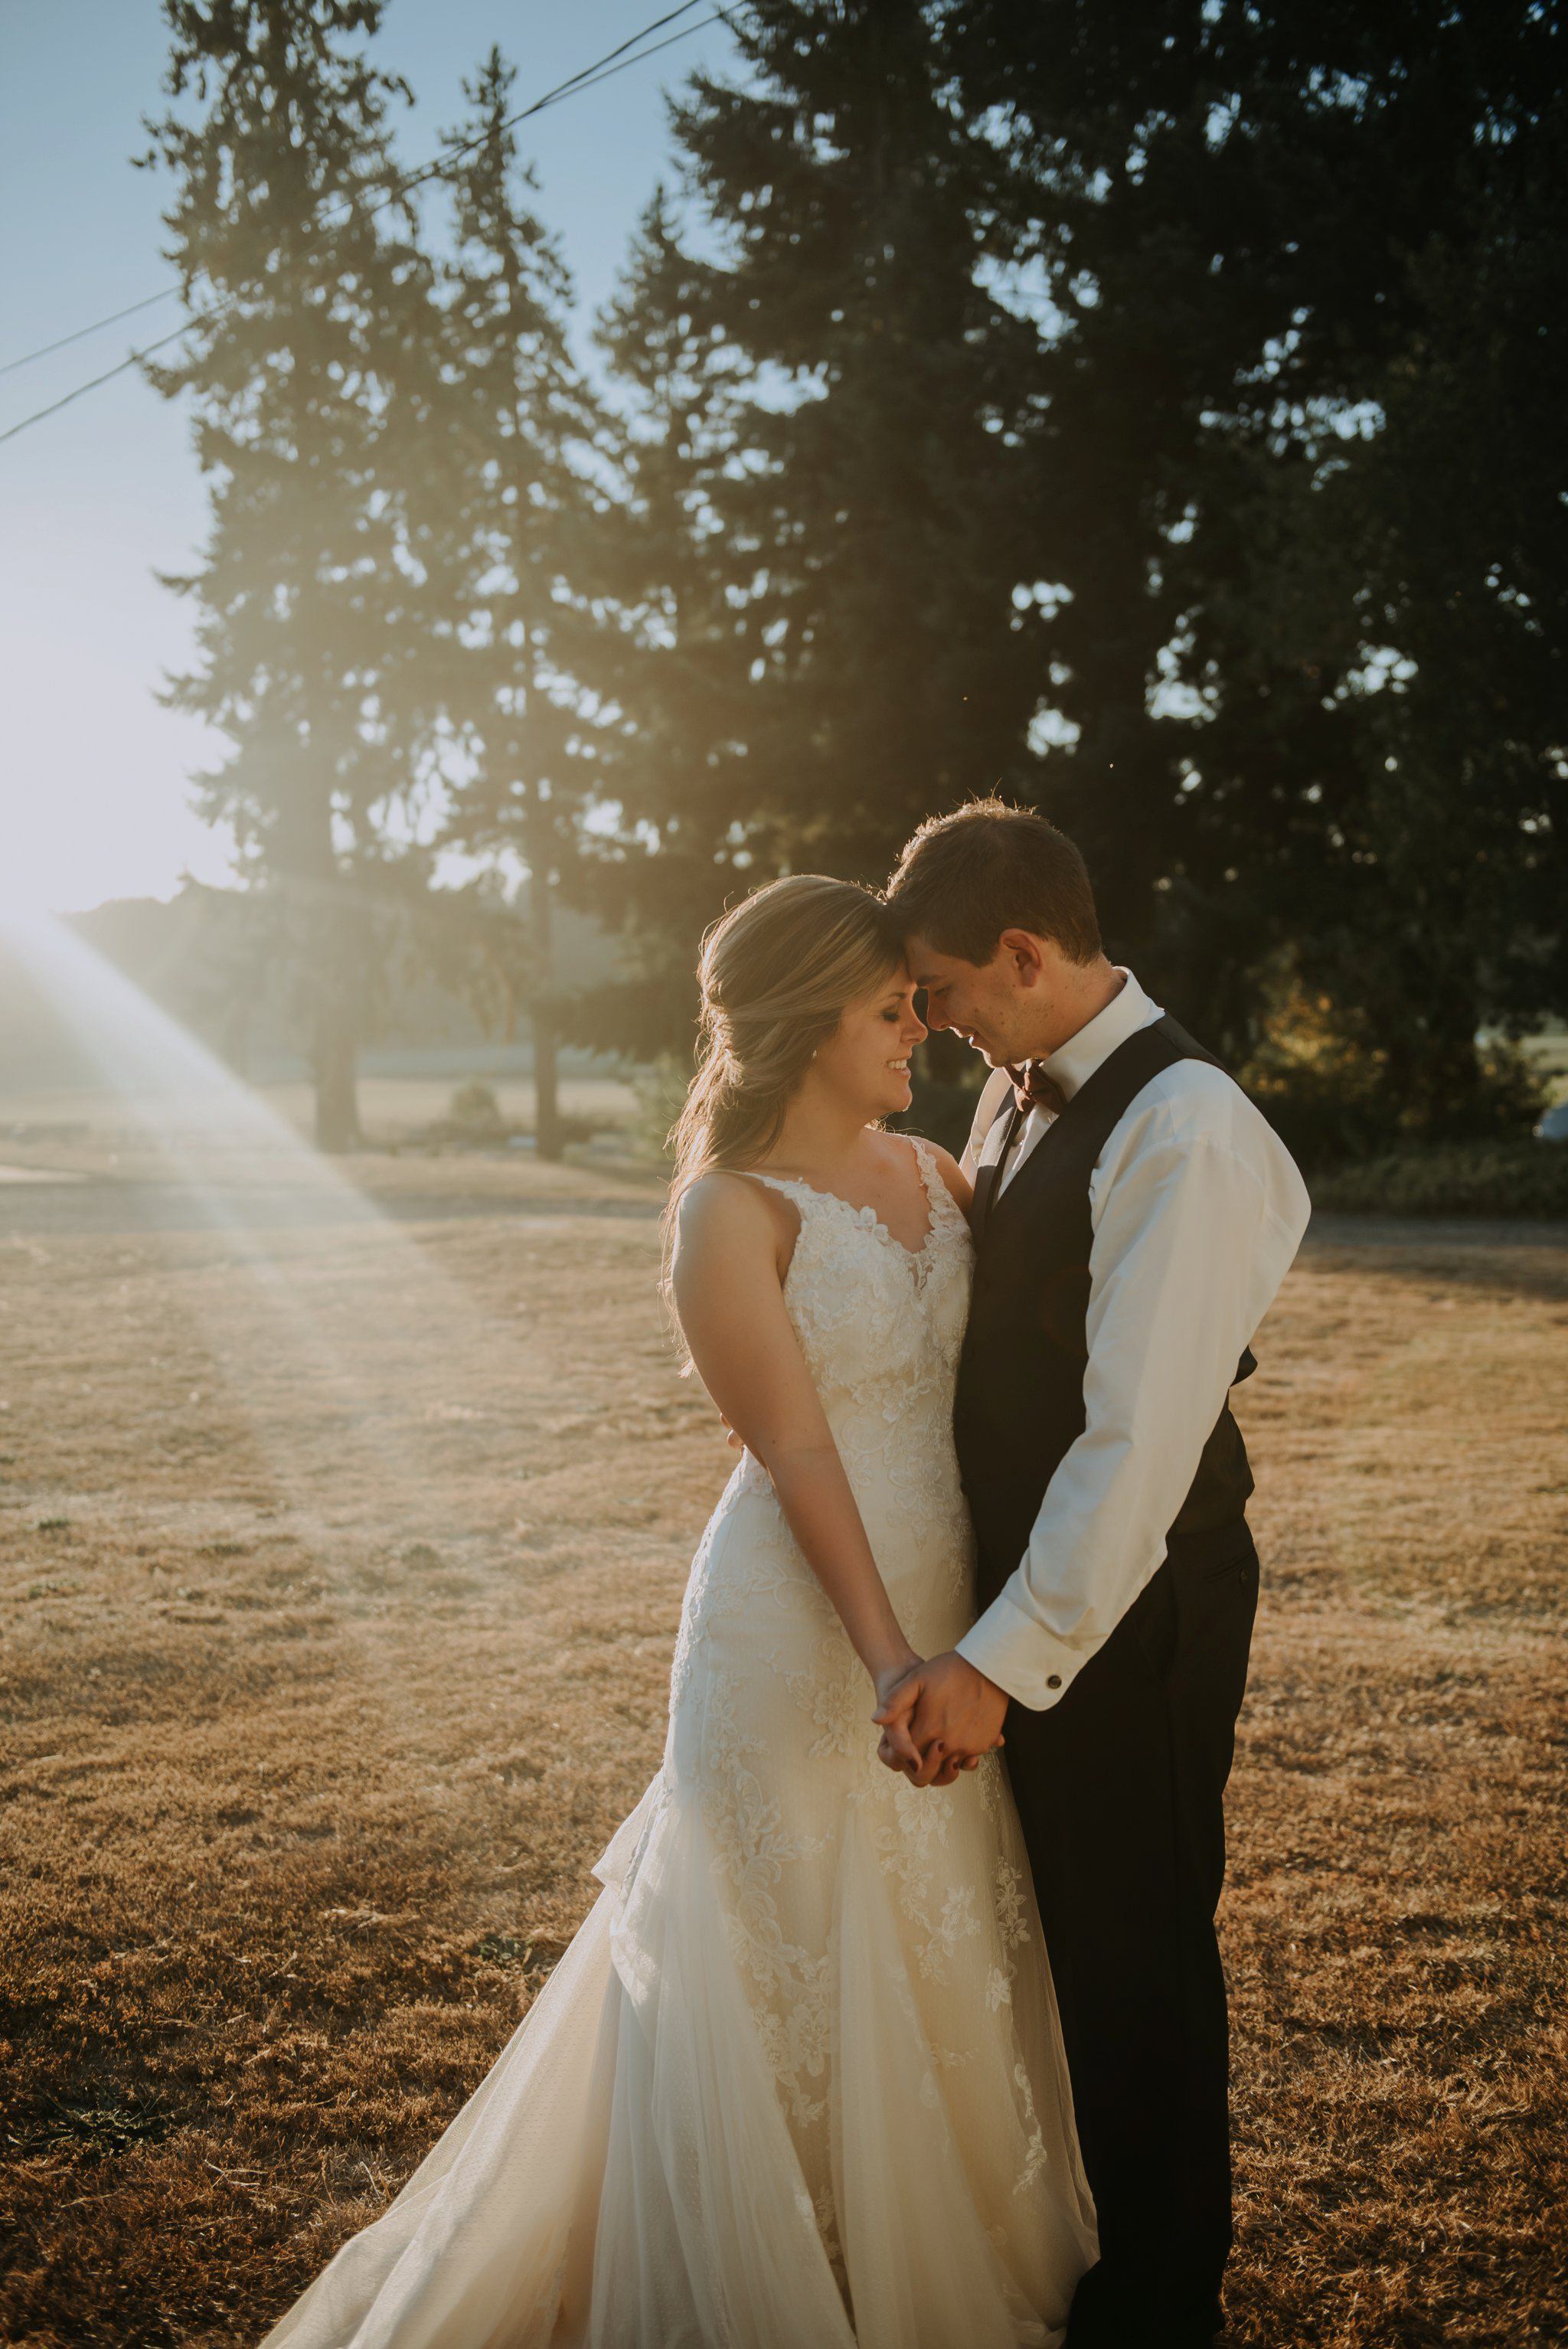 kristen-and-cody-the-kelley-farm-wedding-seattle-photographer-caitlyn-nikula-95.jpg